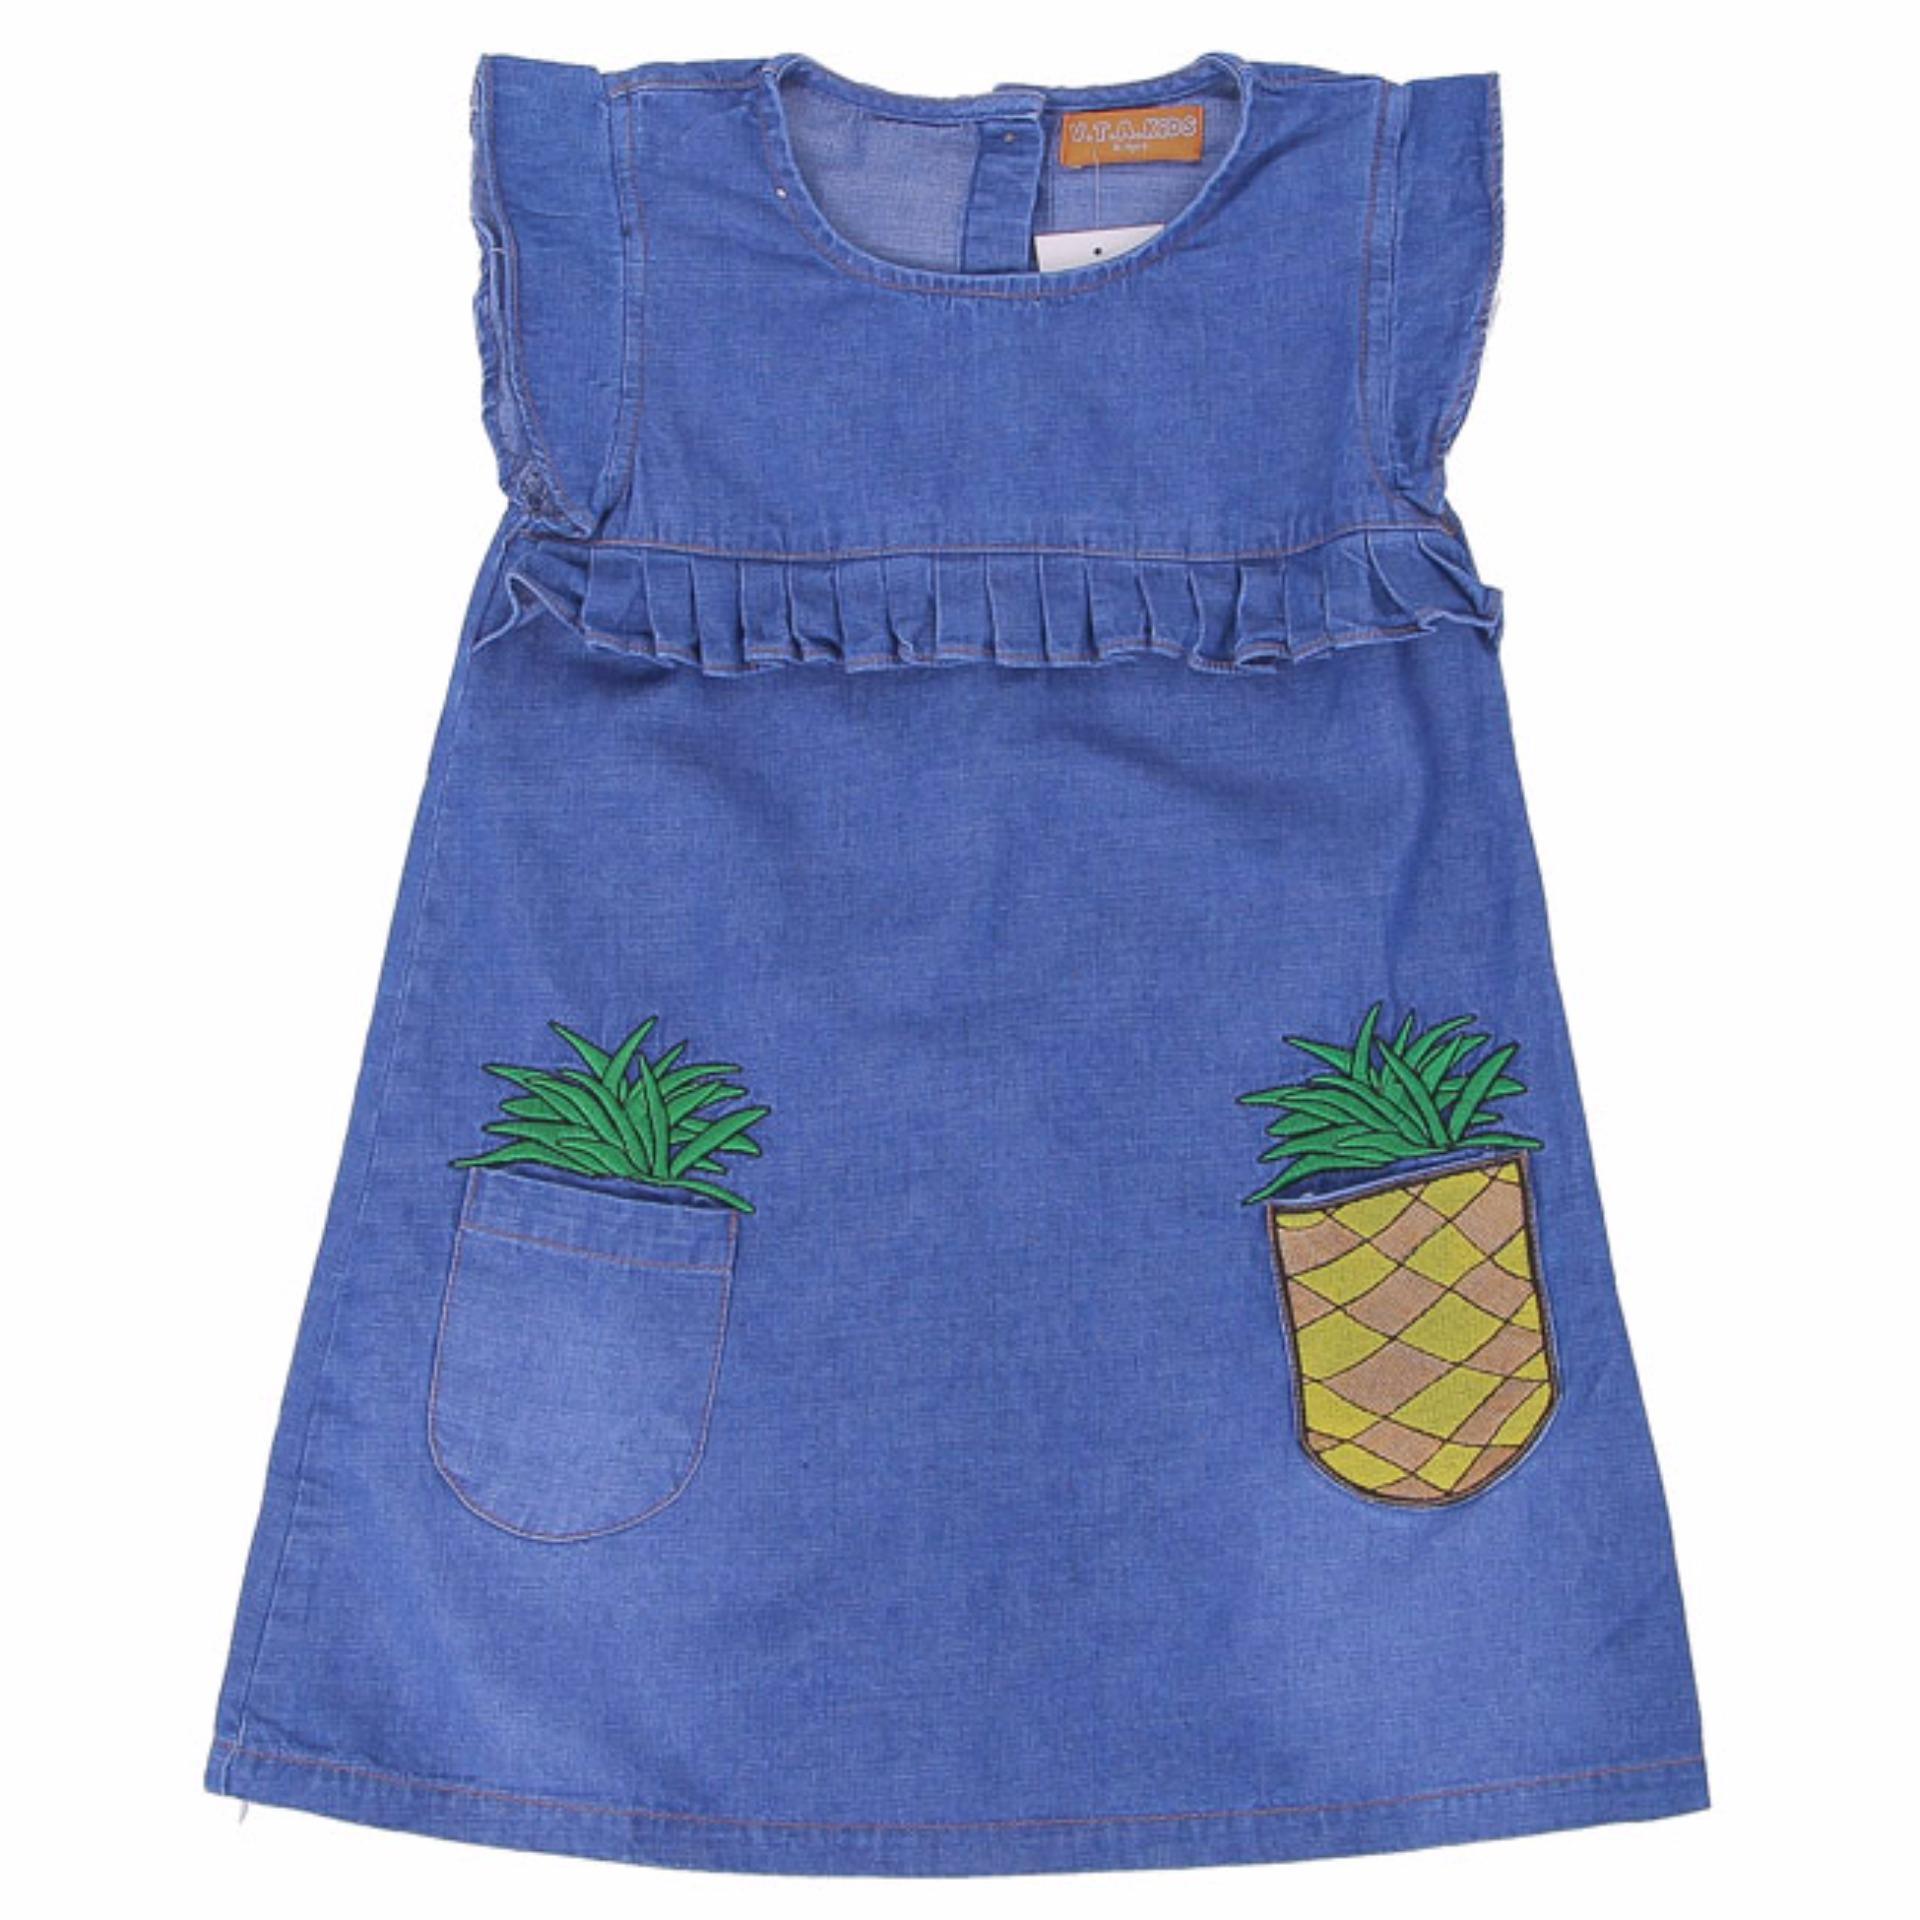 Vta- Đầm Jeans Te Sn Bg70506 4-12